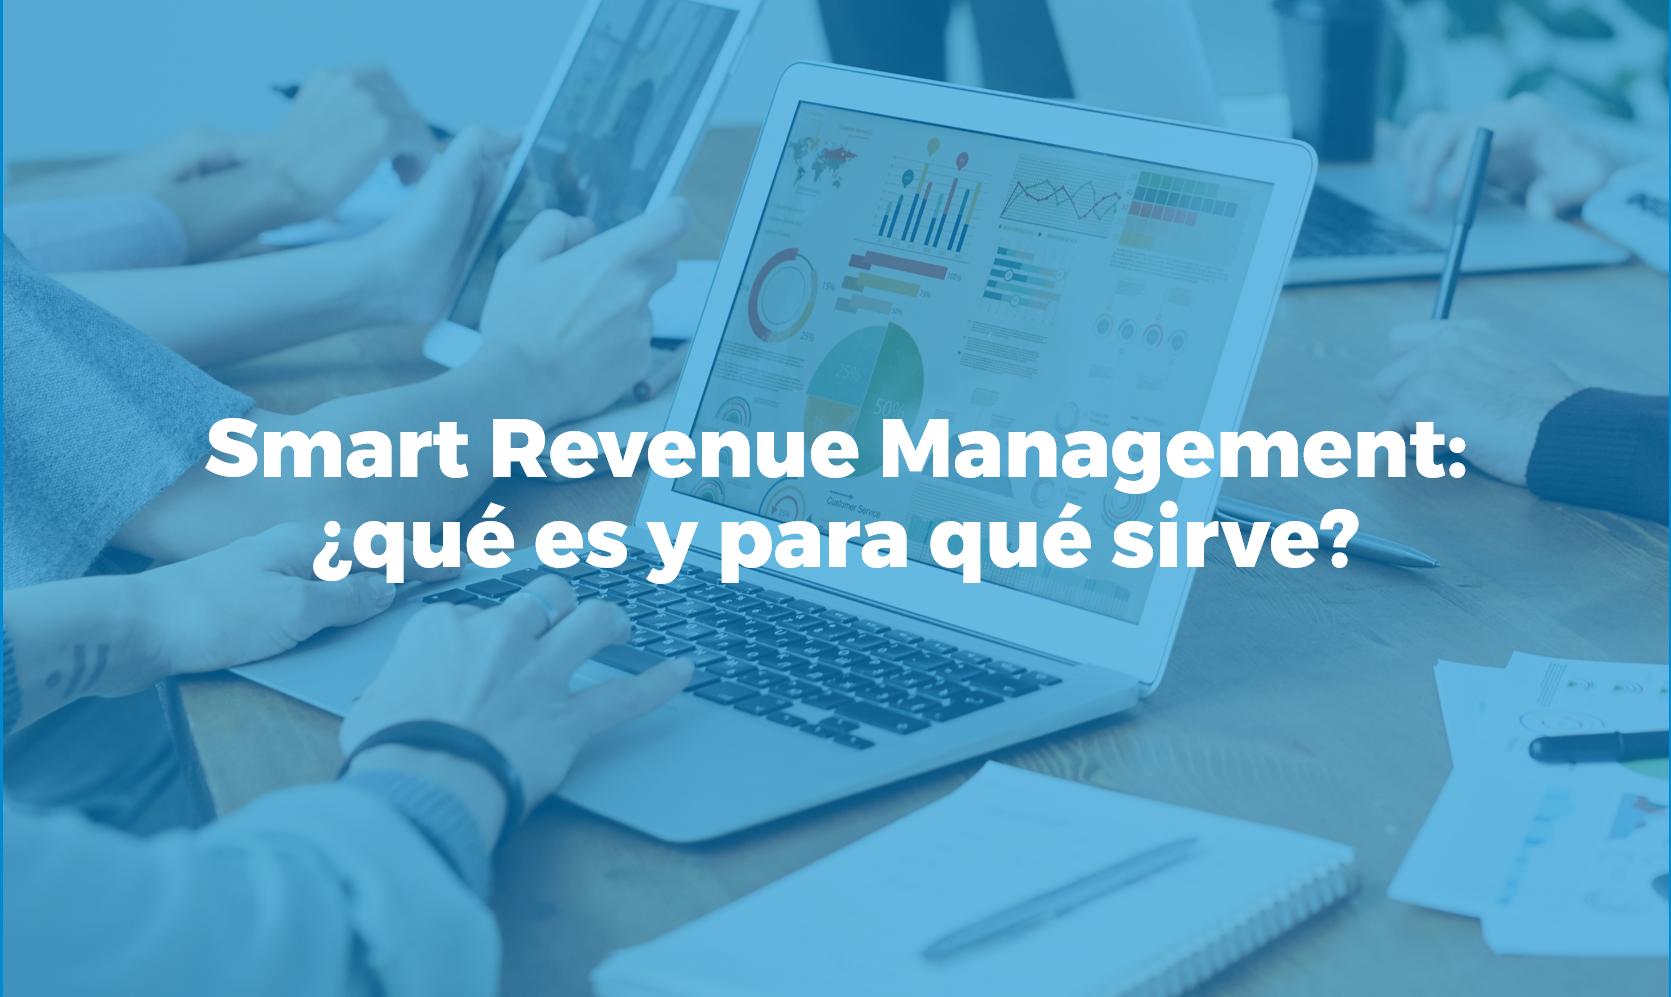 smart-revenue-management-que-es-y-para-que-sirve